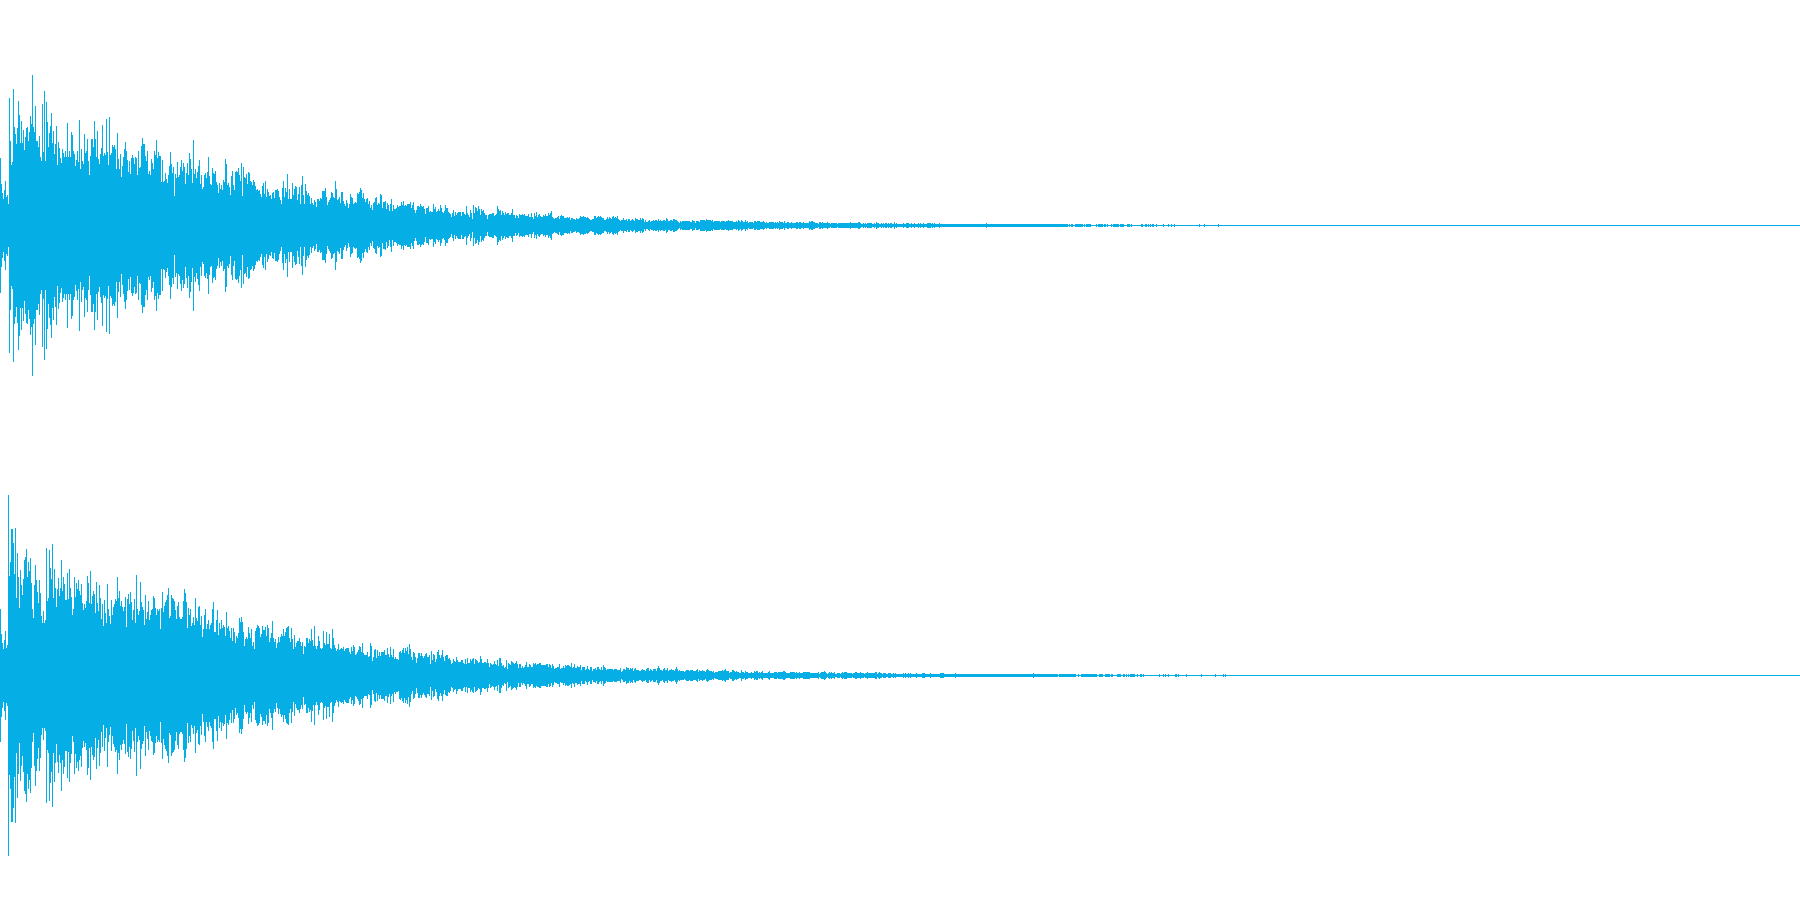 Alchemy 錬金術師の杖の音の再生済みの波形